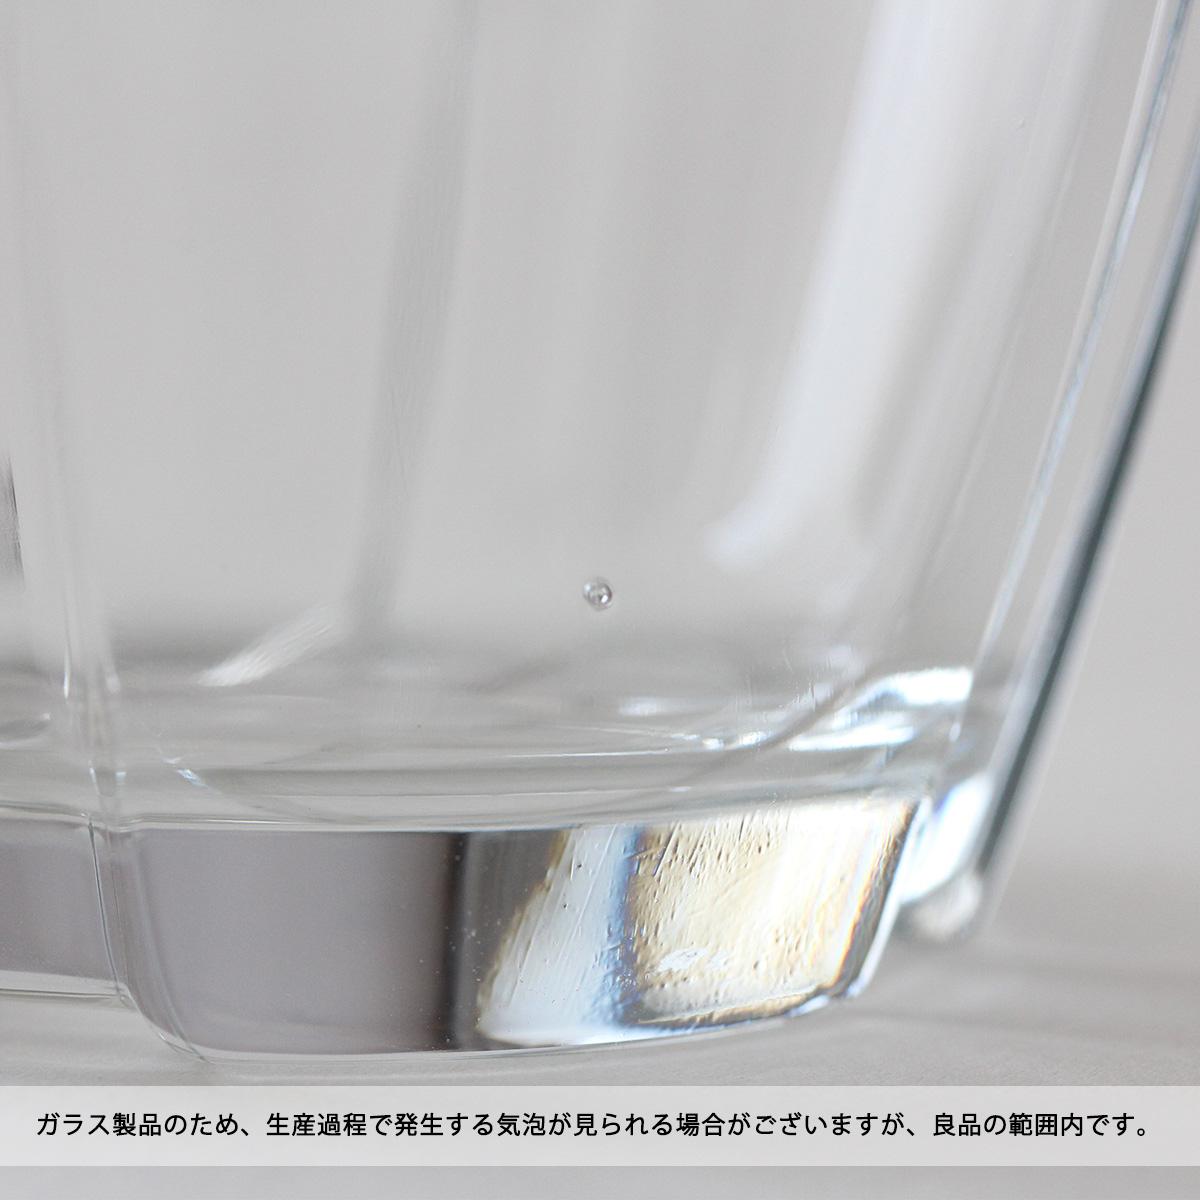 KOSTA BODA (コスタ ボダ) Bruk.(ブルック) ボウル Sサイズ H6×Φ16cm スモーキーグレー北欧/食器/皿